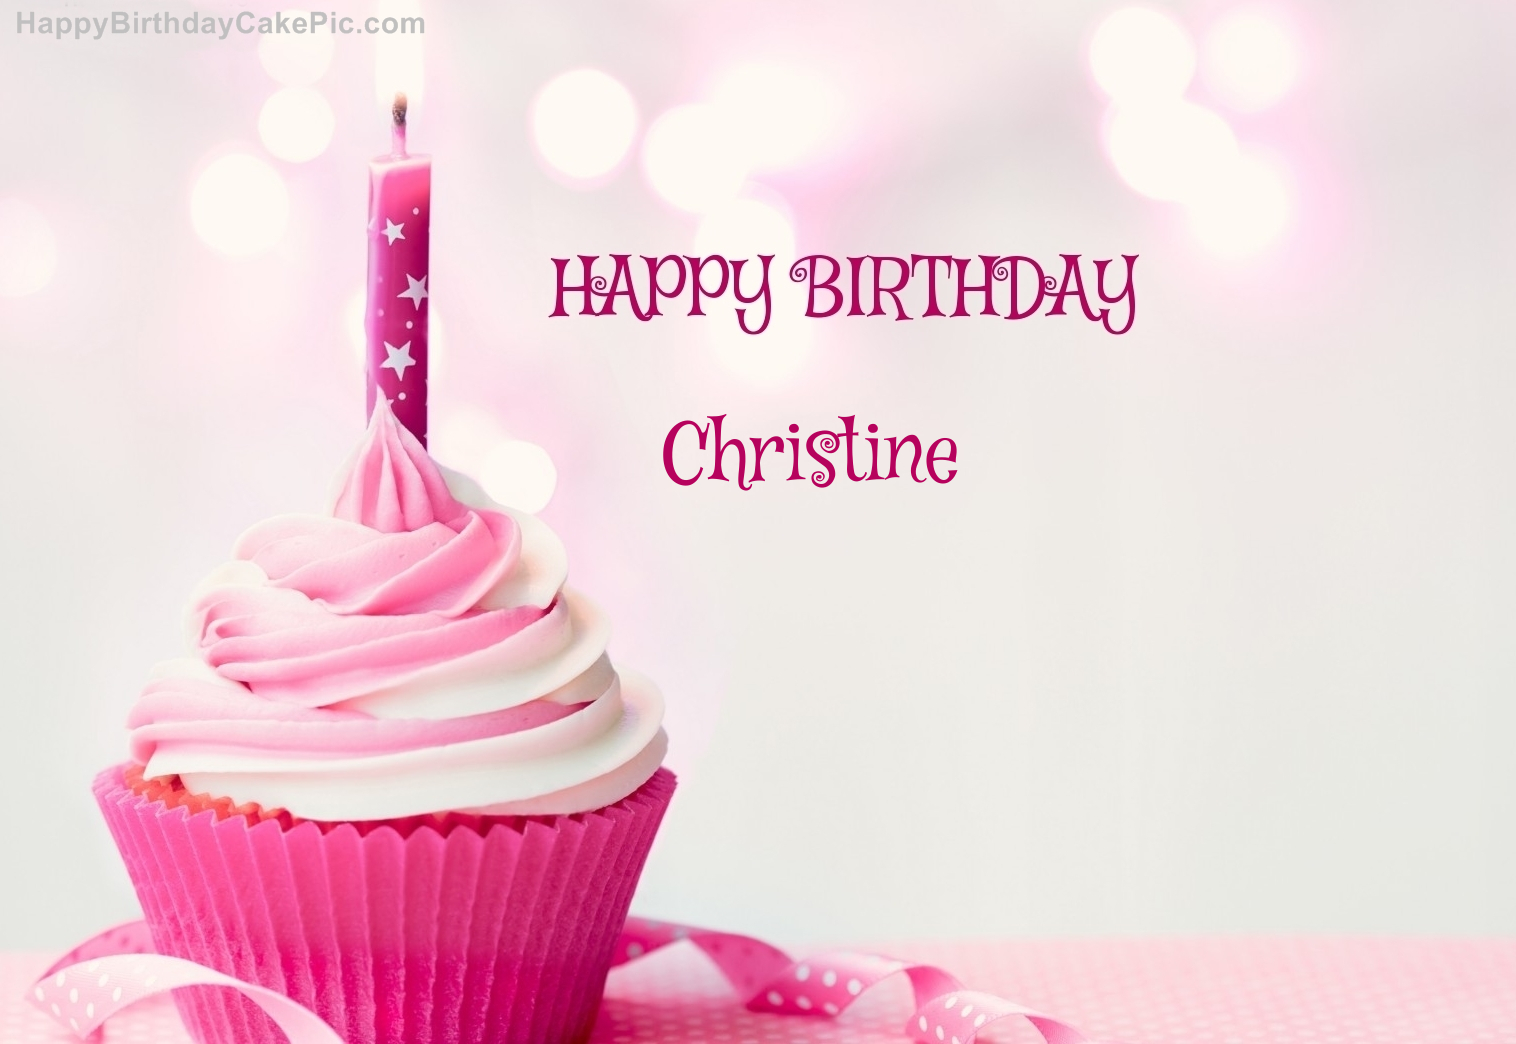 Christine Birthday Photo Cakes